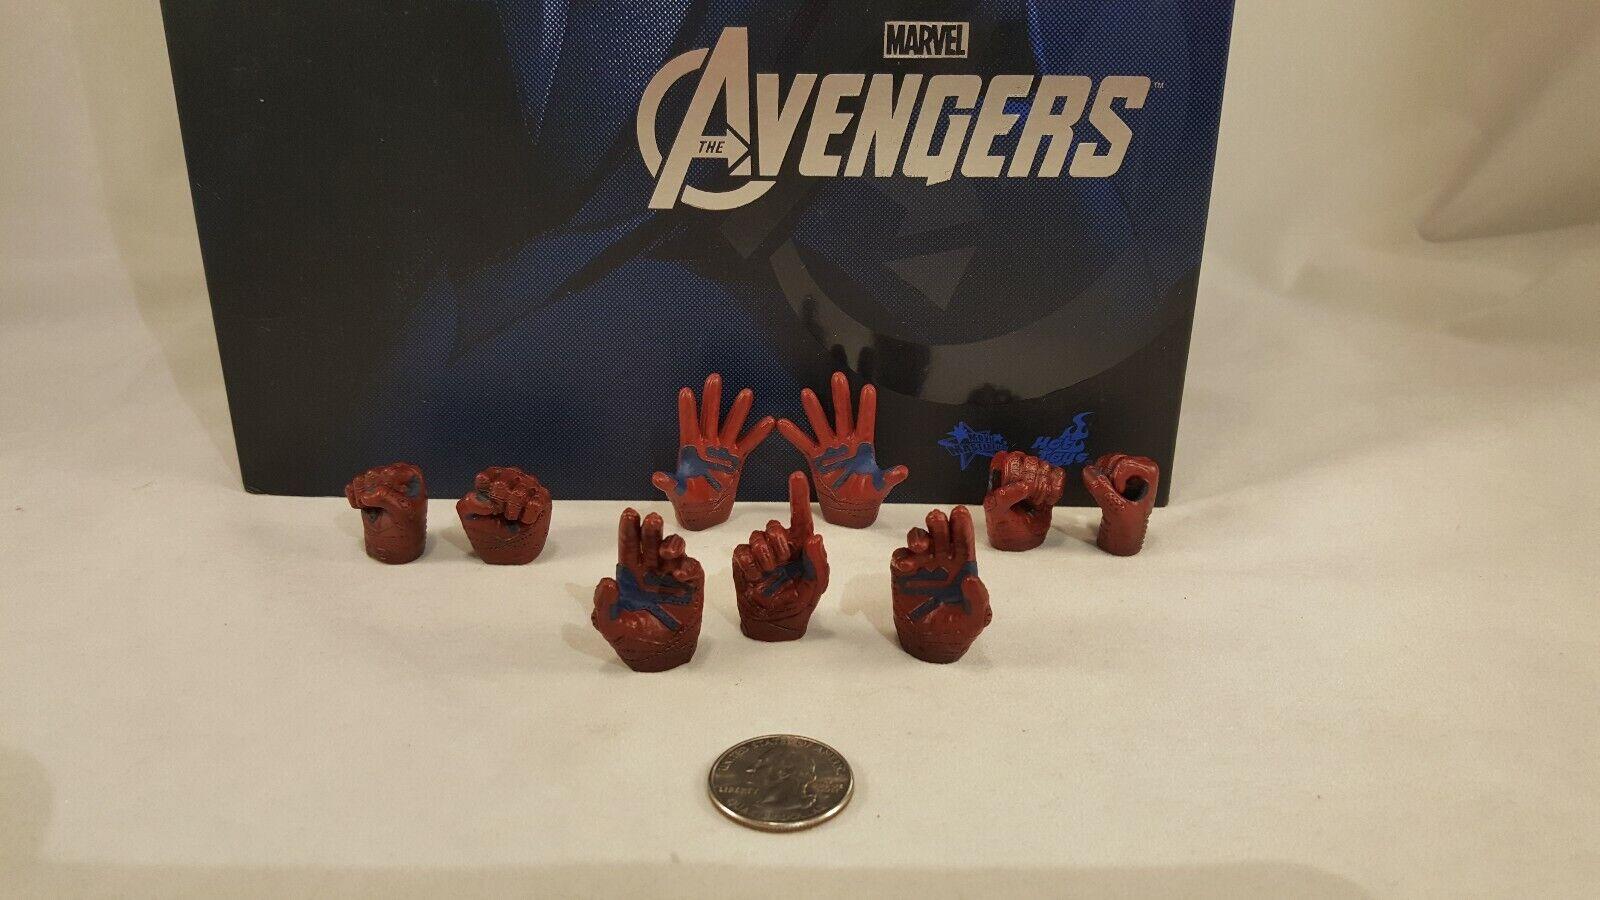 Hot  Toys MMS174 Avengers 1 6 Captain America Action Figure'S les 9 Mains seuleHommest  magasin fashional à vendre